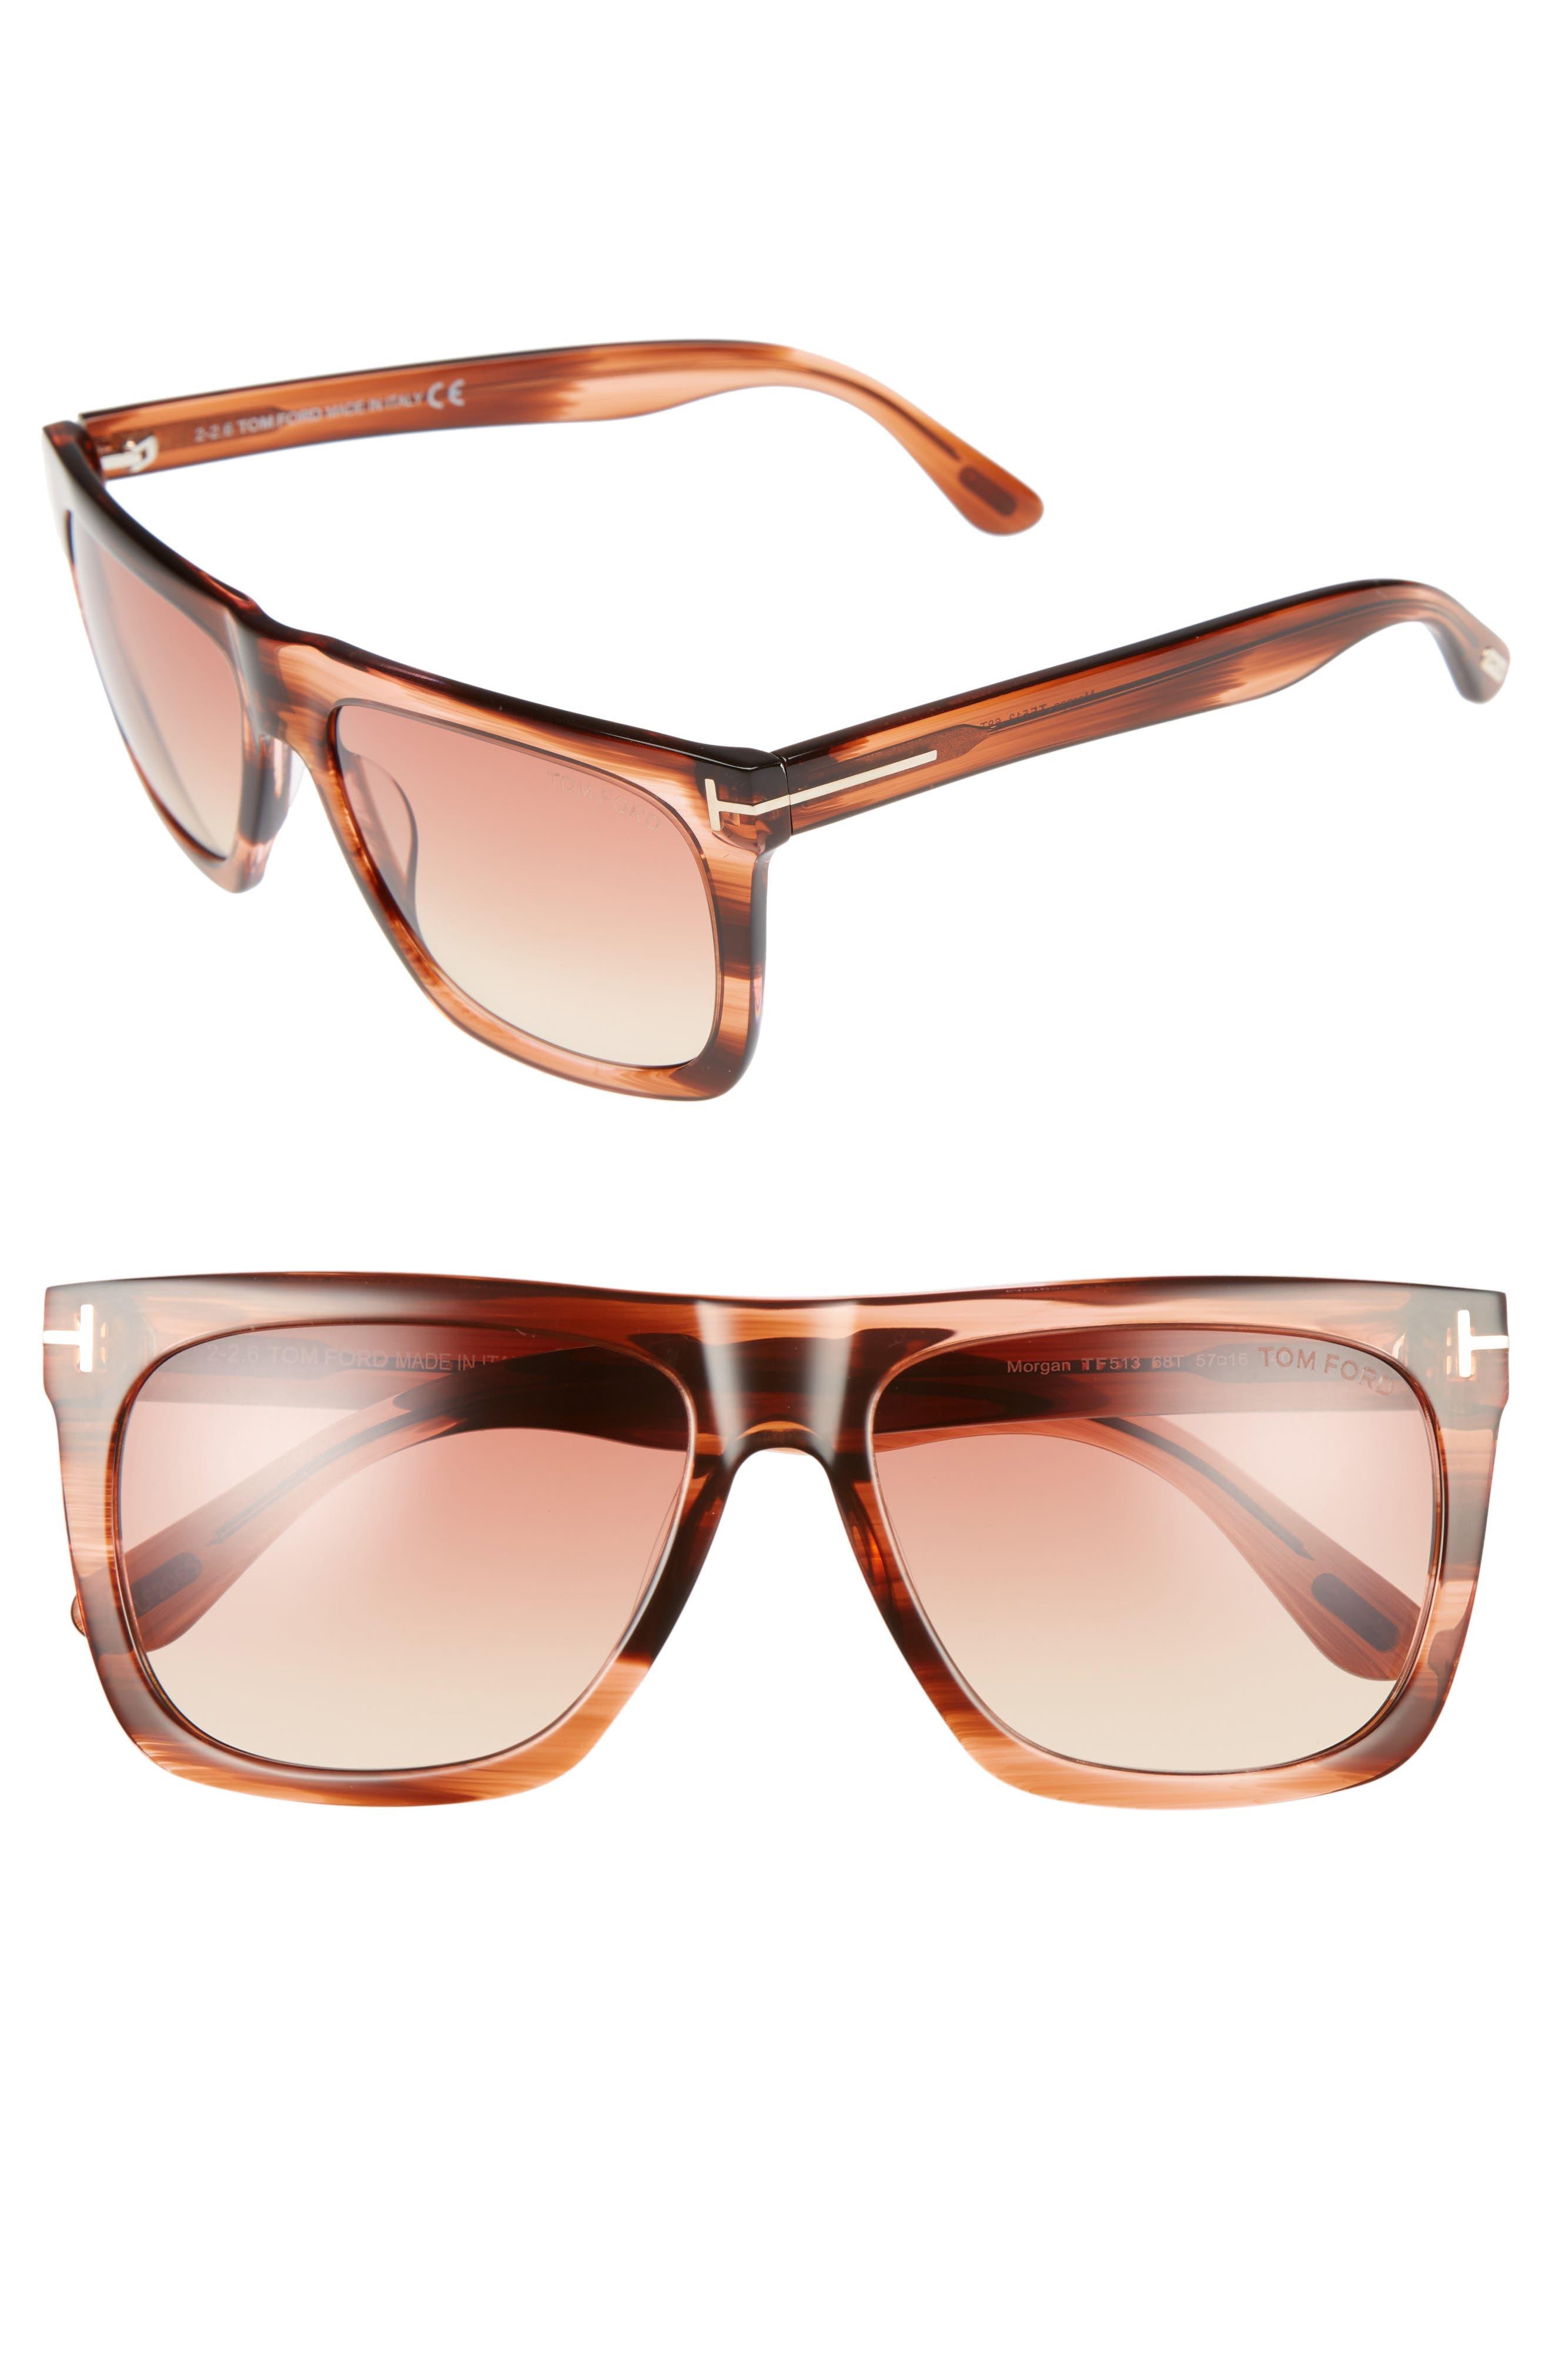 Tom Ford Morgan 57mm Flat Top Sunglasses